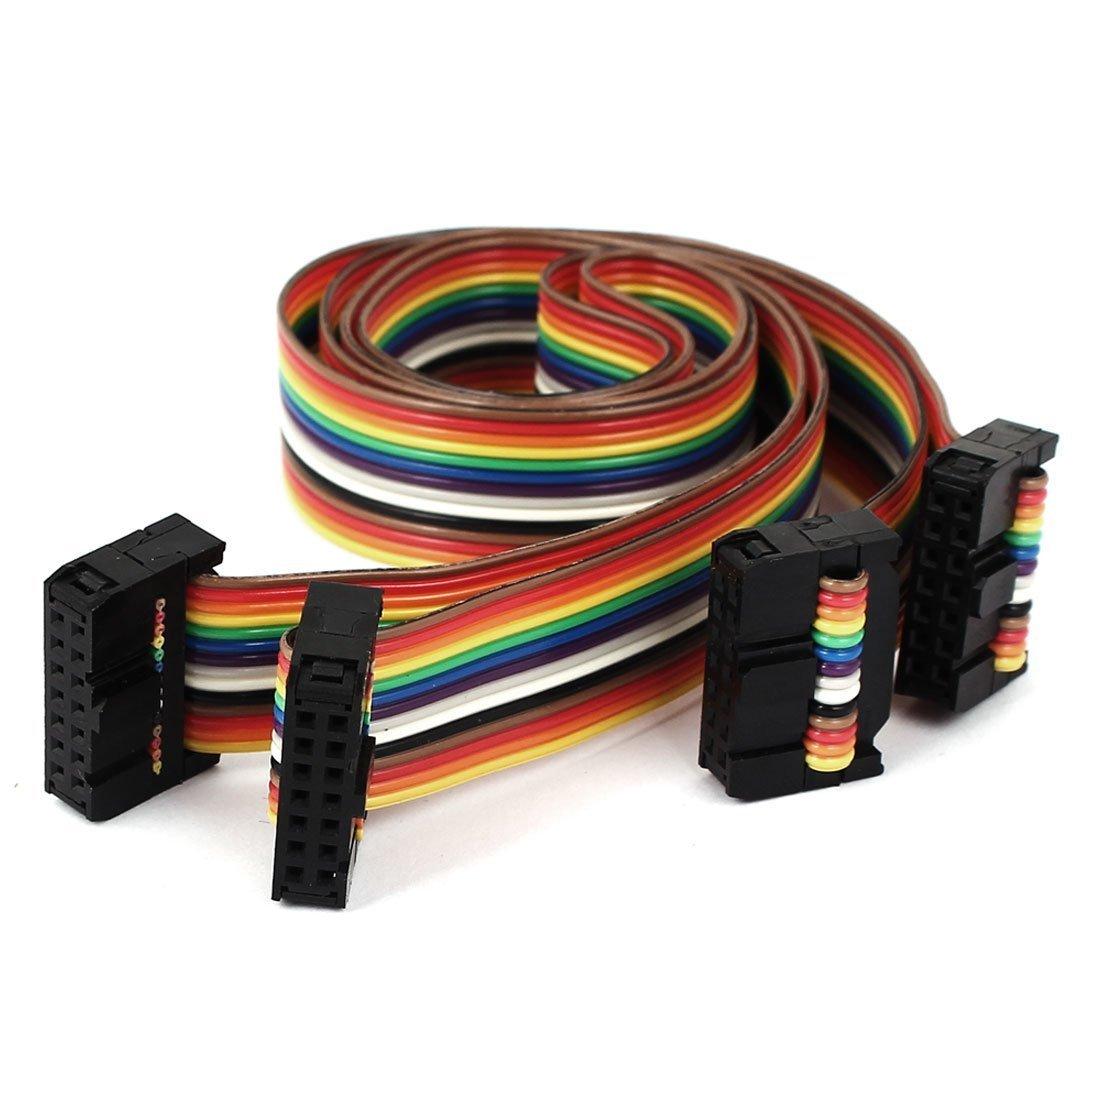 sourcingmap® Conector de cable plano IDC Arco iris Plana 2pcs 43cm 1.4ft 14P 14 forma F/F a16031500ux1748